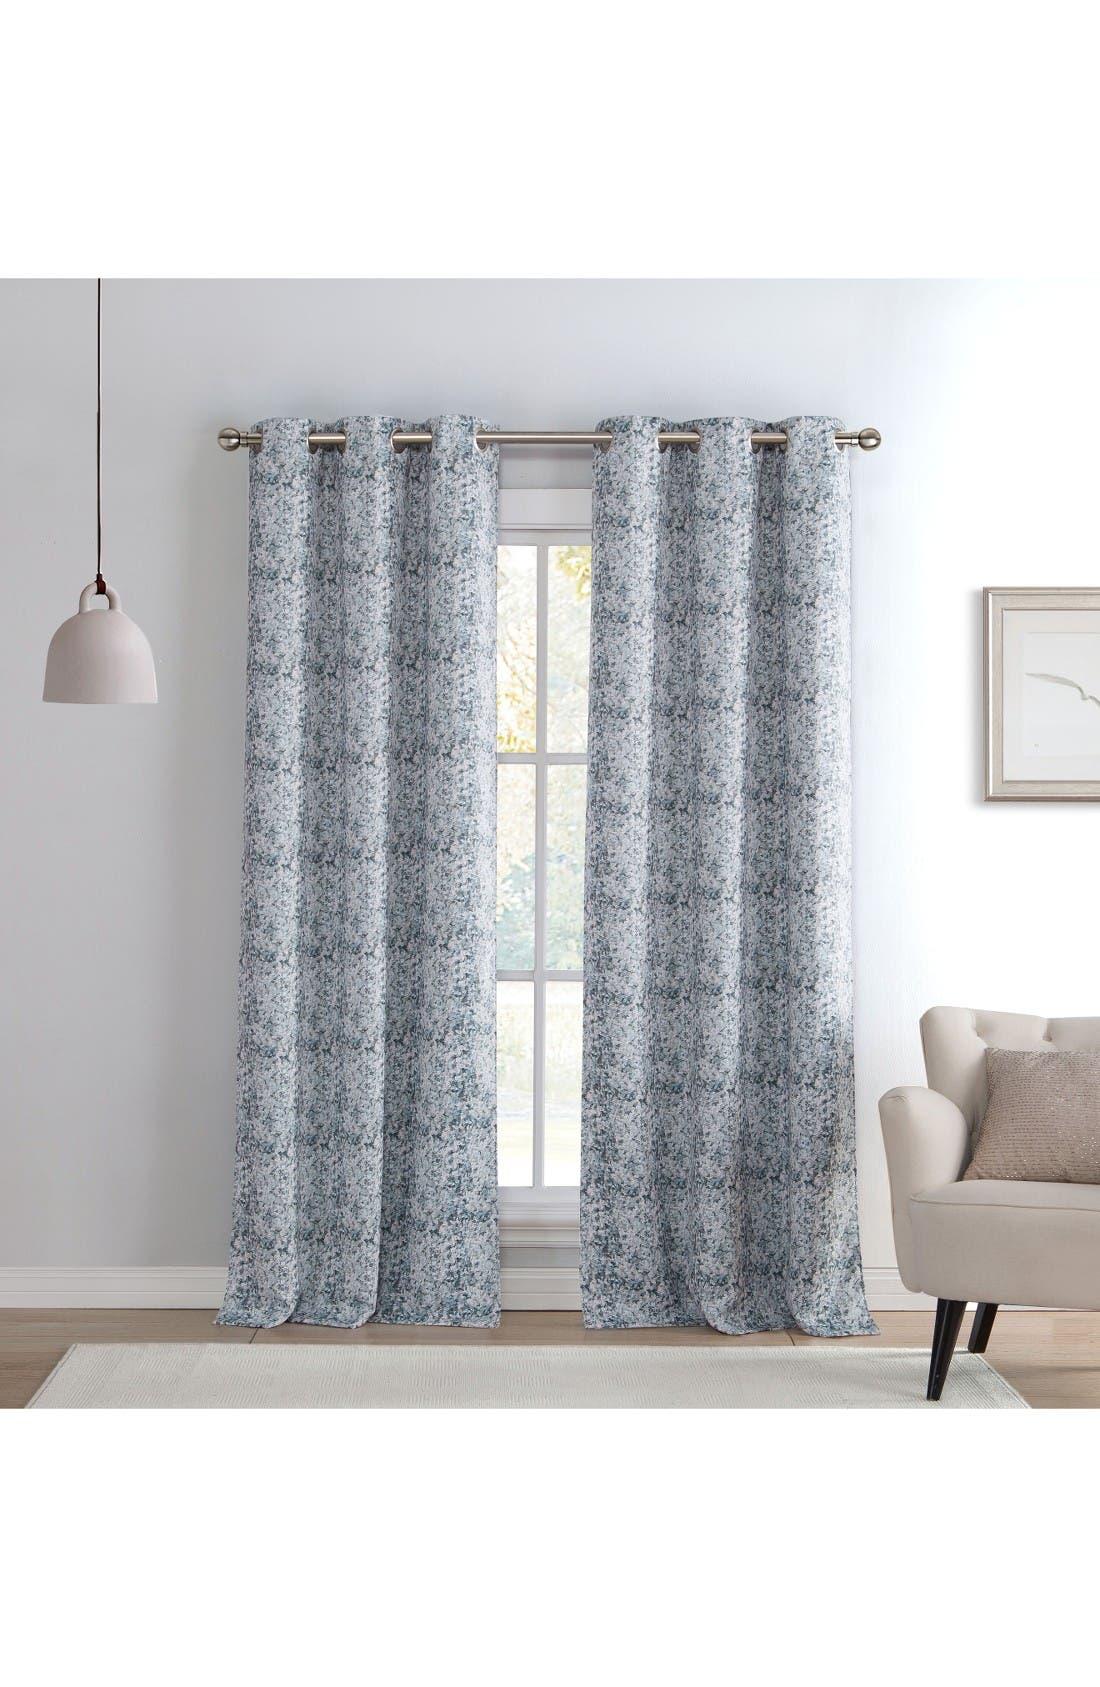 Good Kensie Window Treatments | Curtains, Valances U0026 Window Panels |  Nordstrom